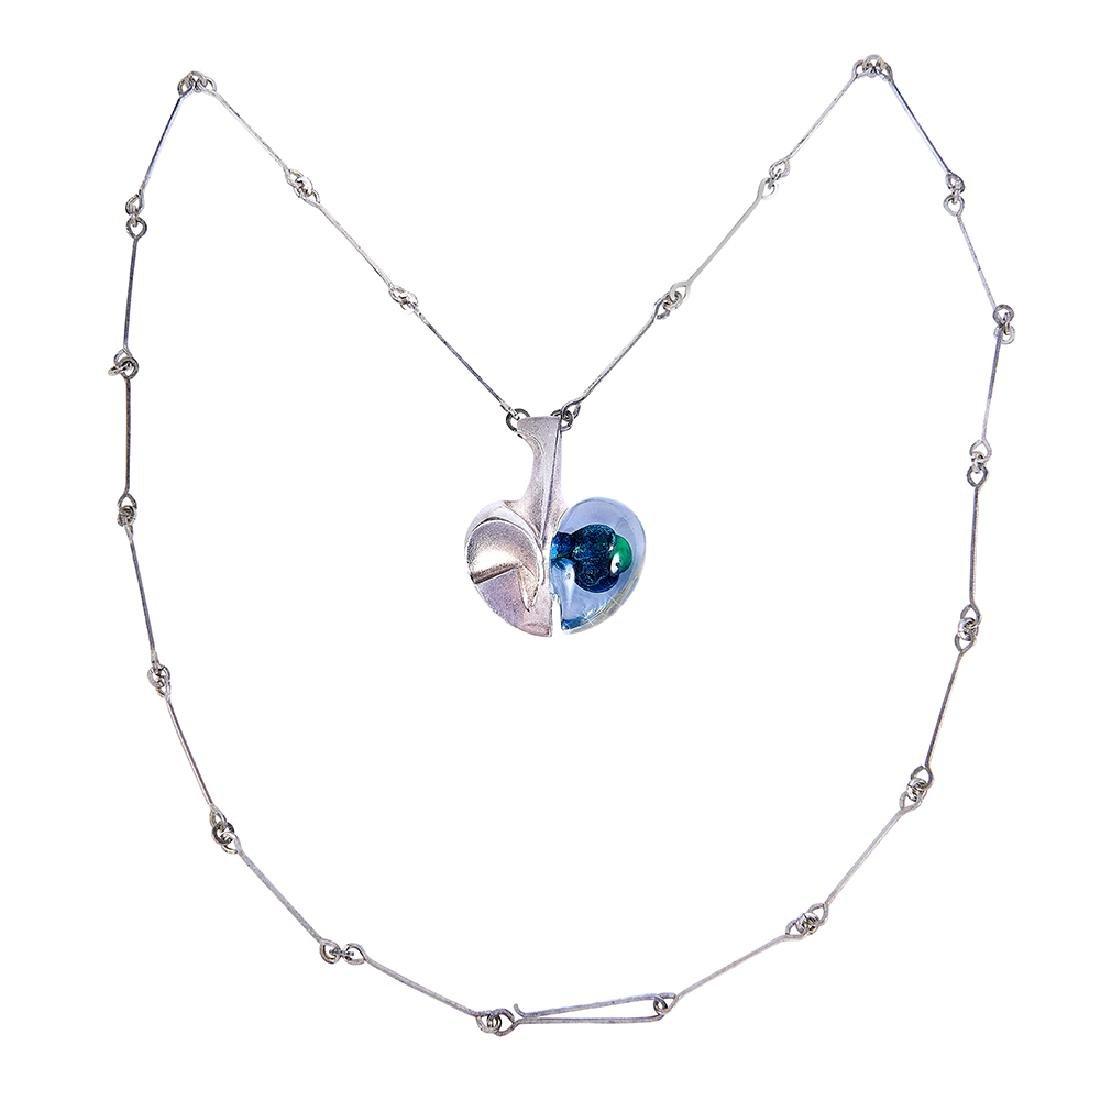 Björn Weckström for Lapponia necklace pendant